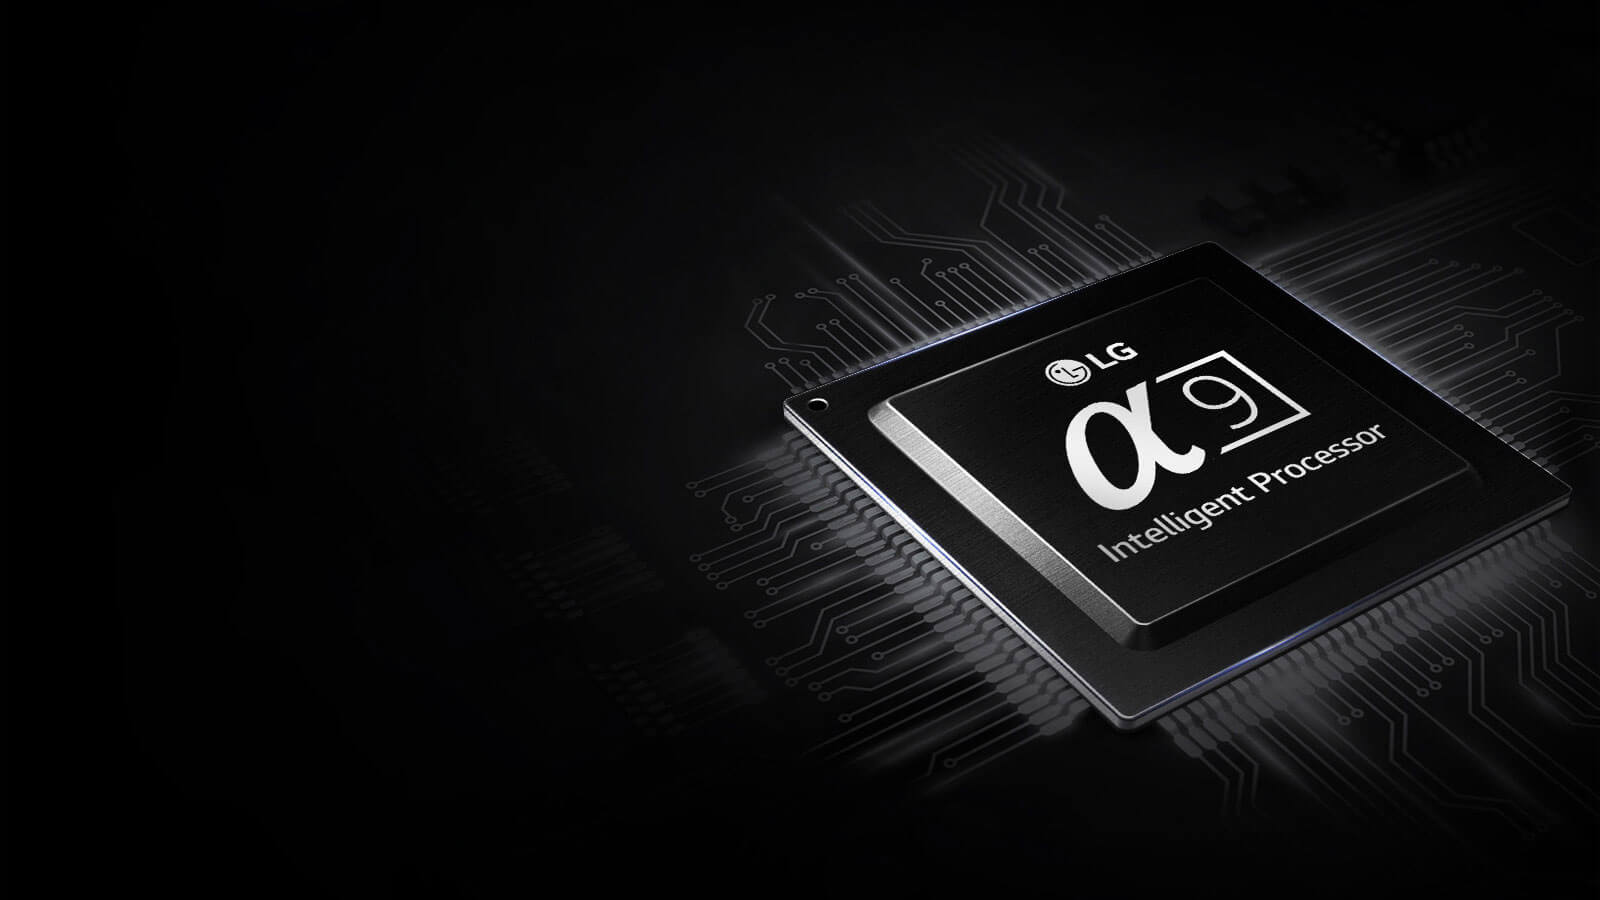 LG OLED alpha9 Prozessor